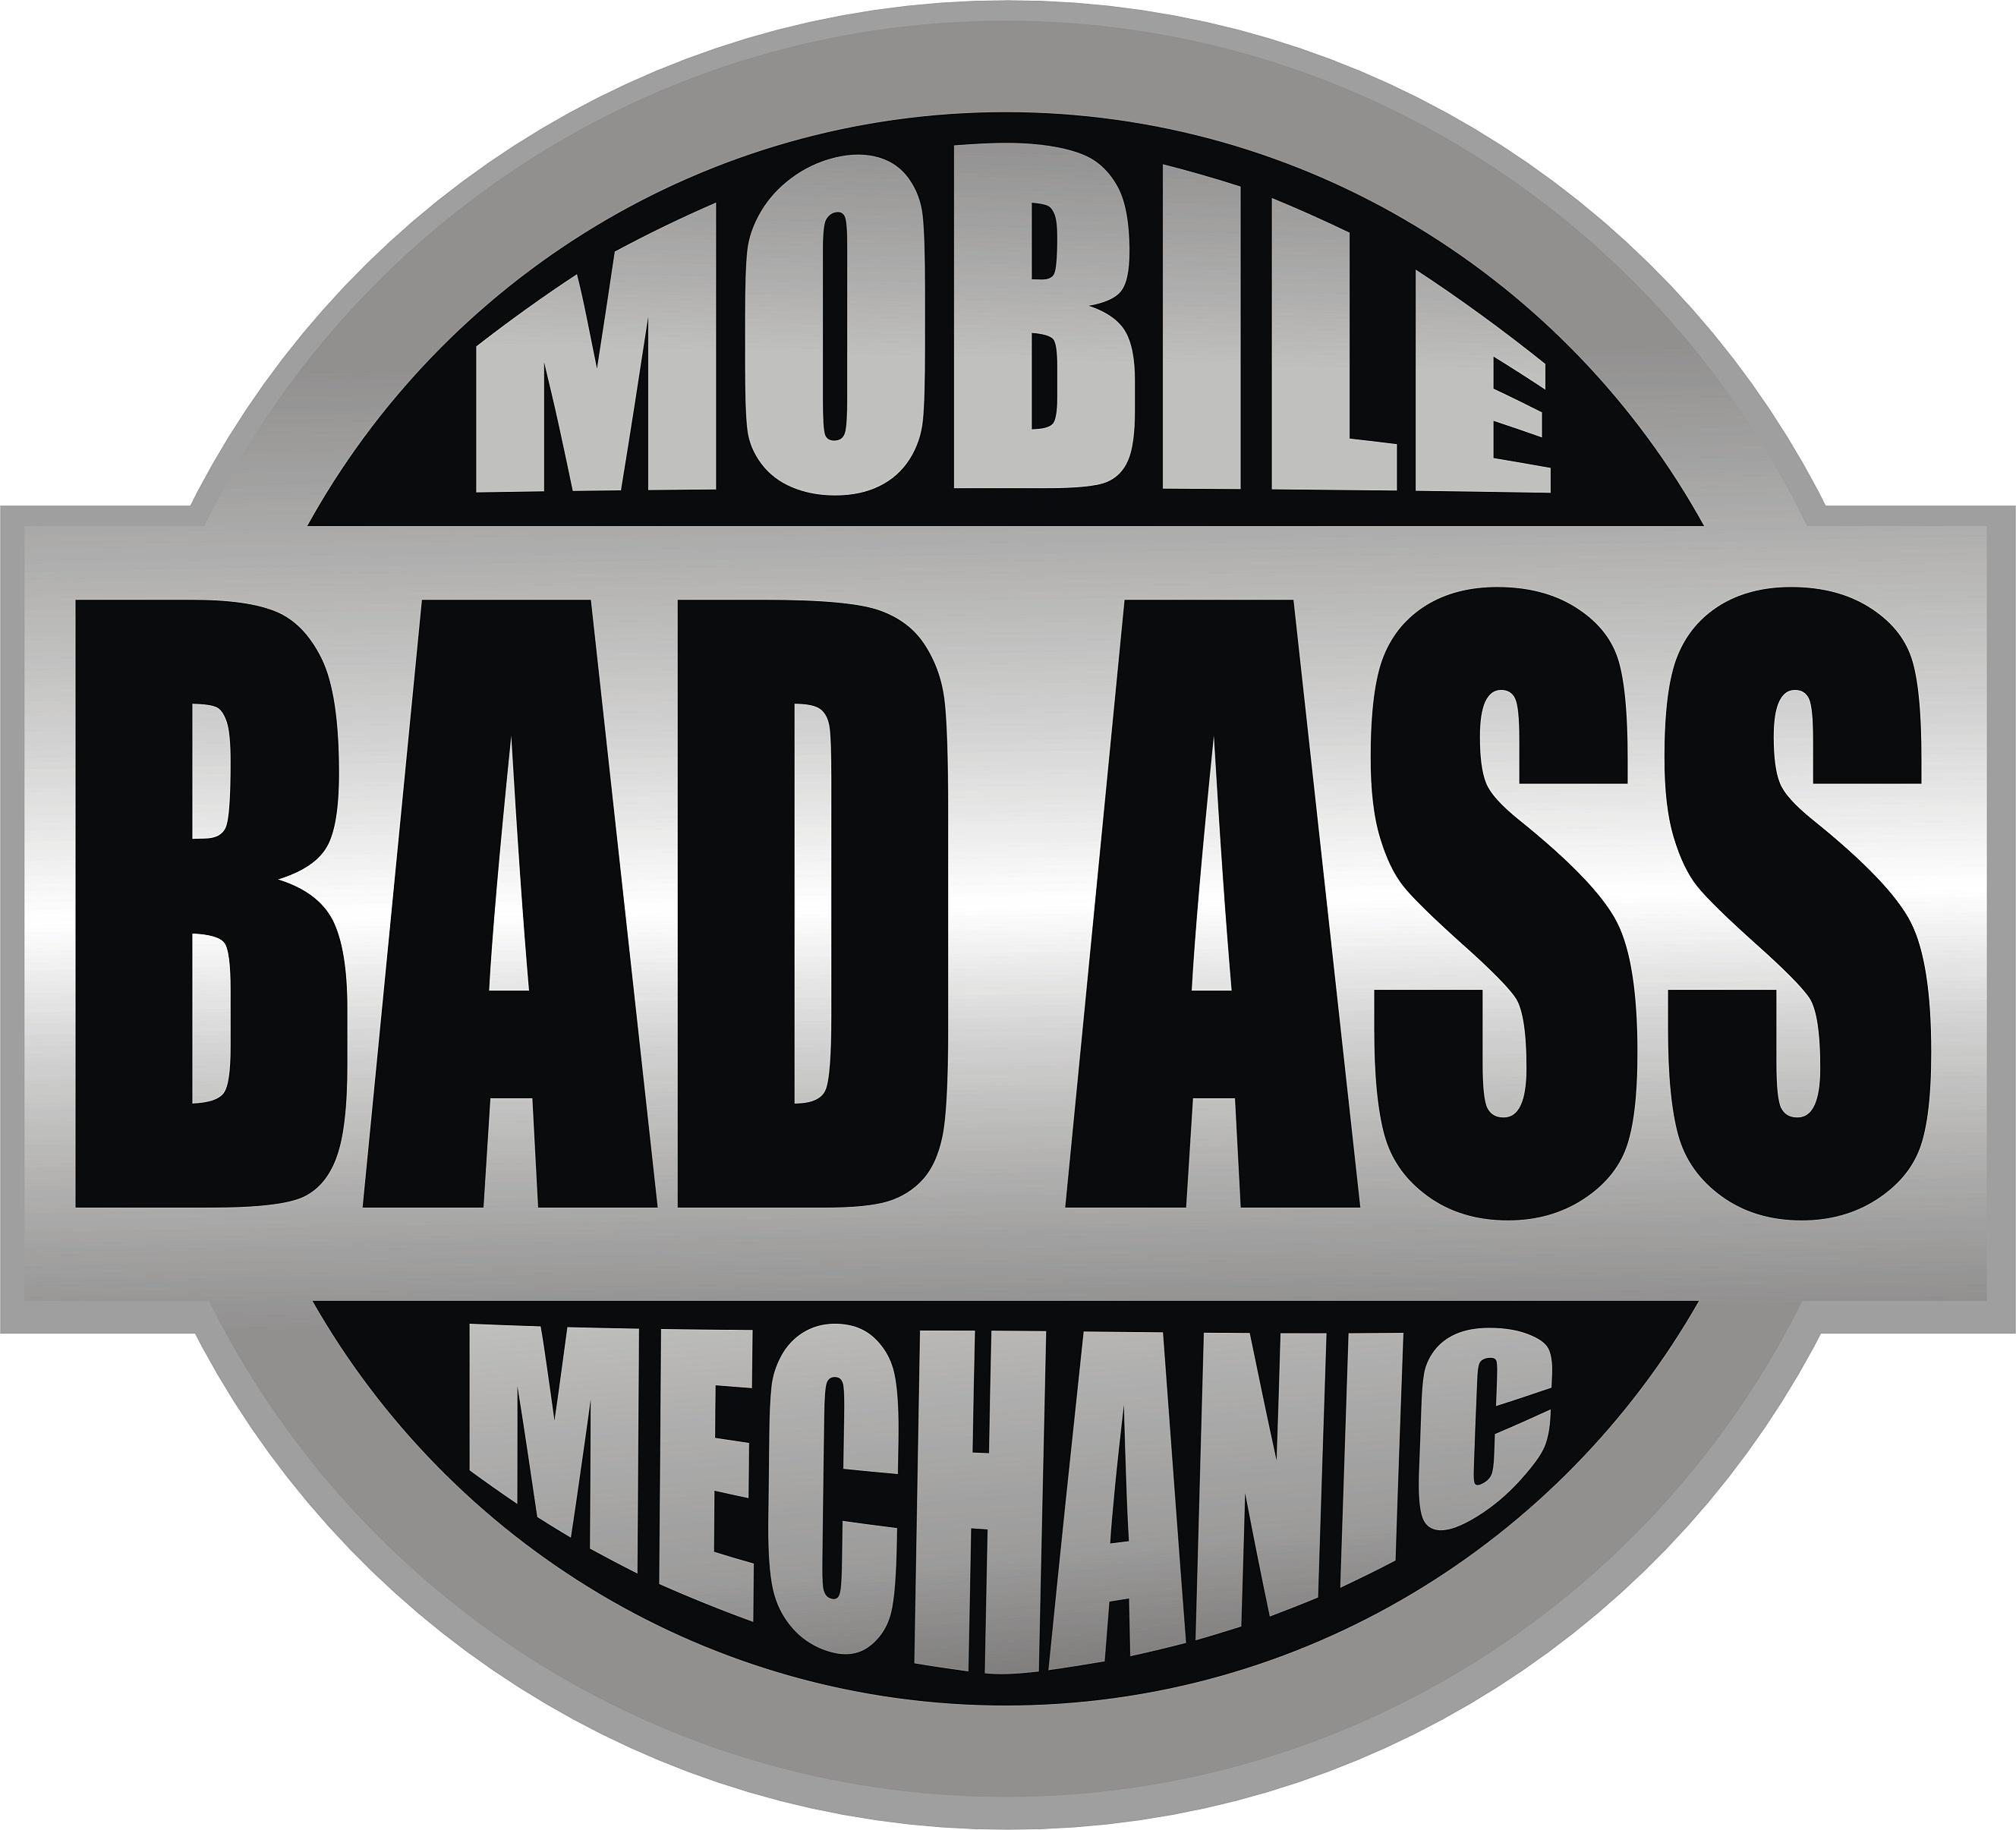 Badass Mobile Mechanic 7326 S 2700 W, West Jordan, UT